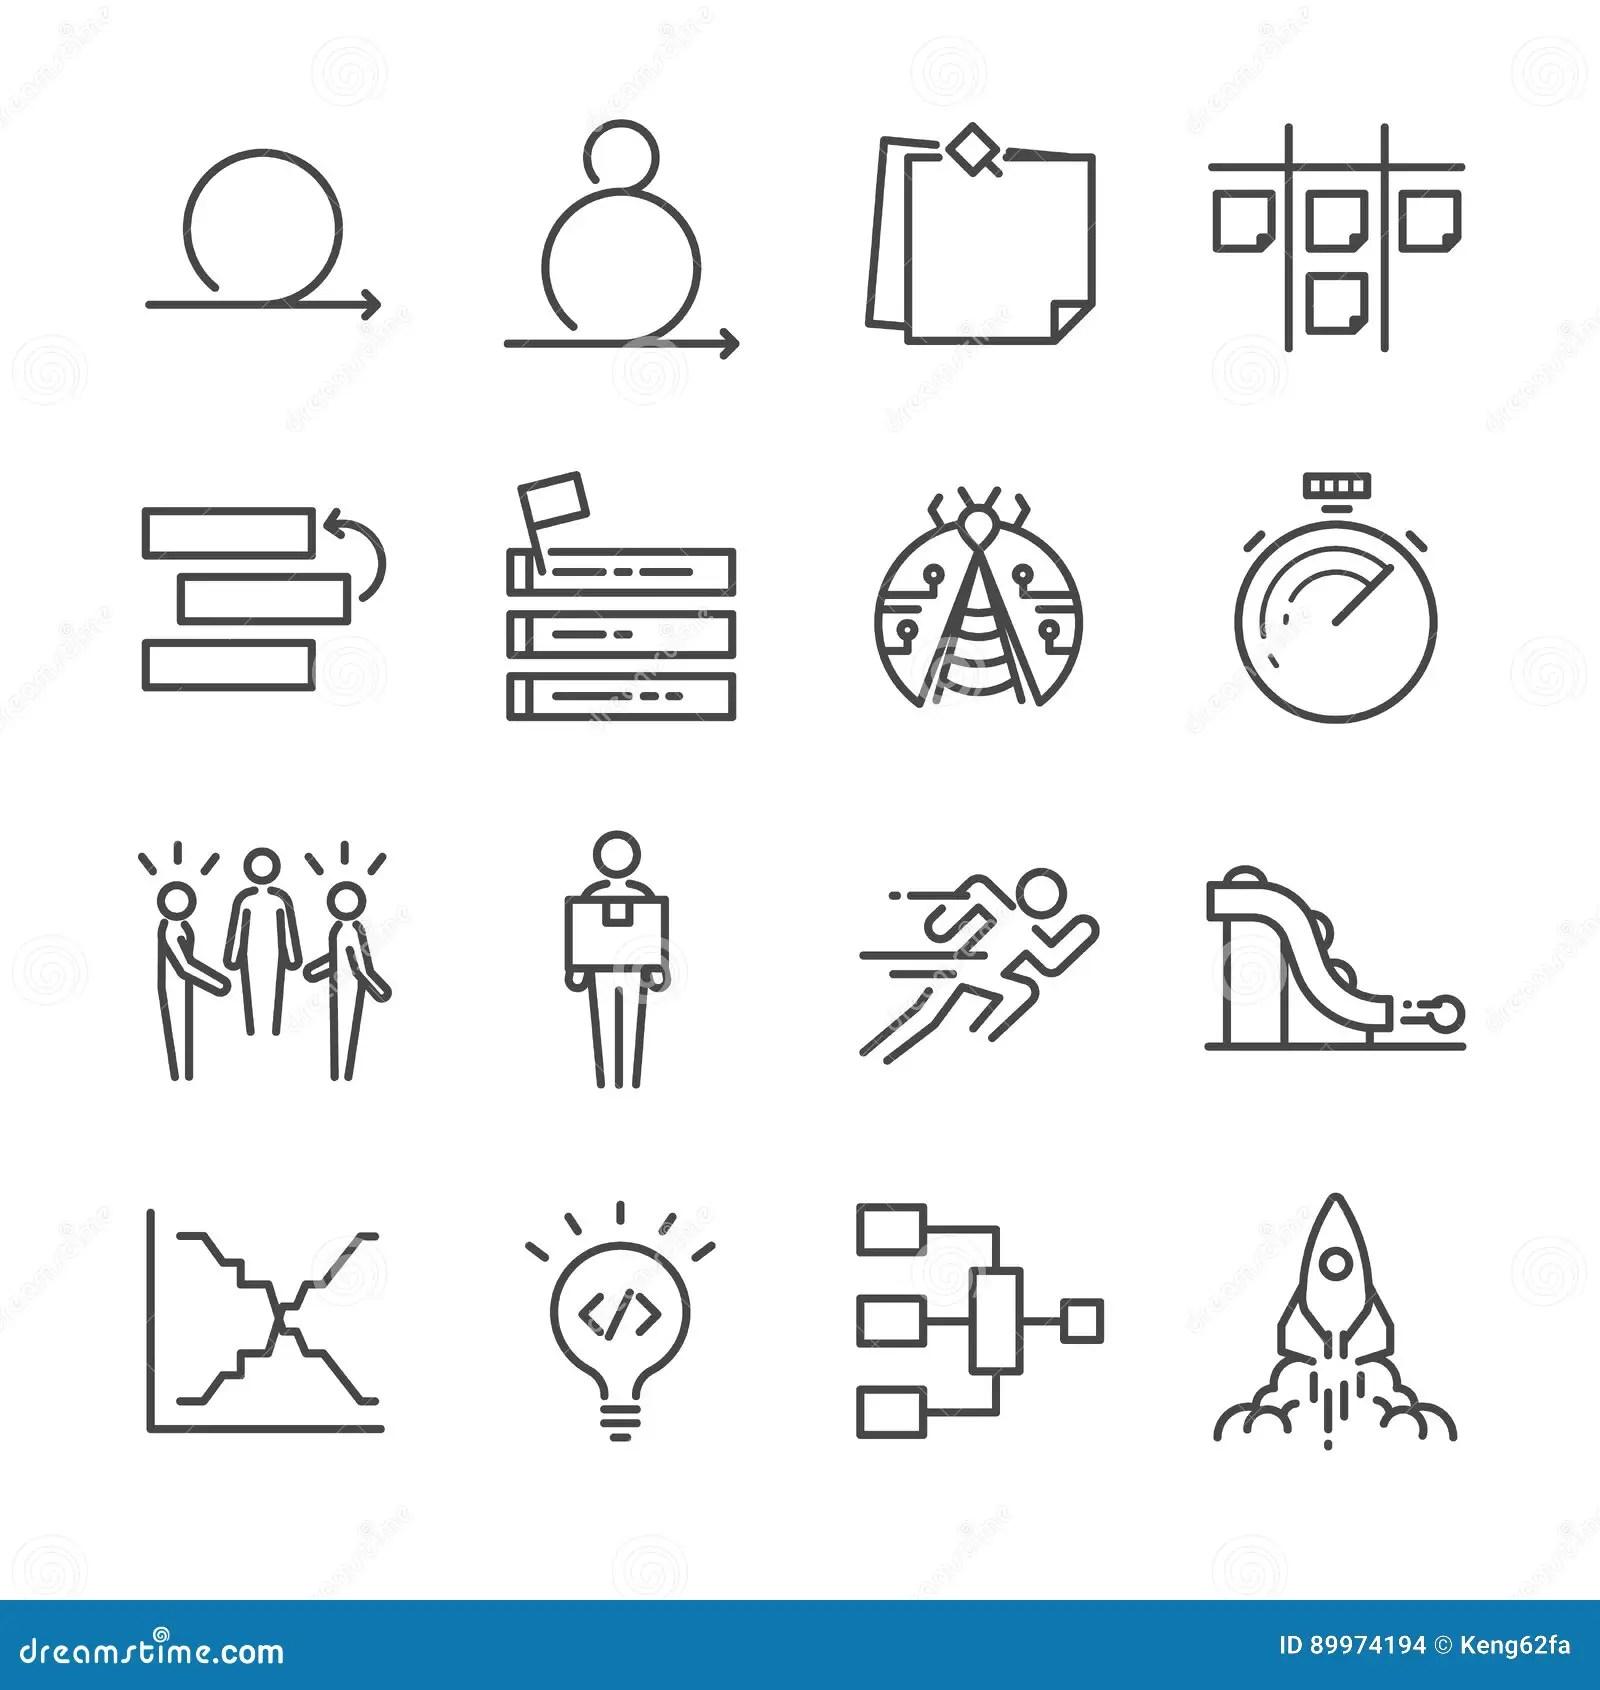 Scrum Development Methodology Icons Vector Illustration